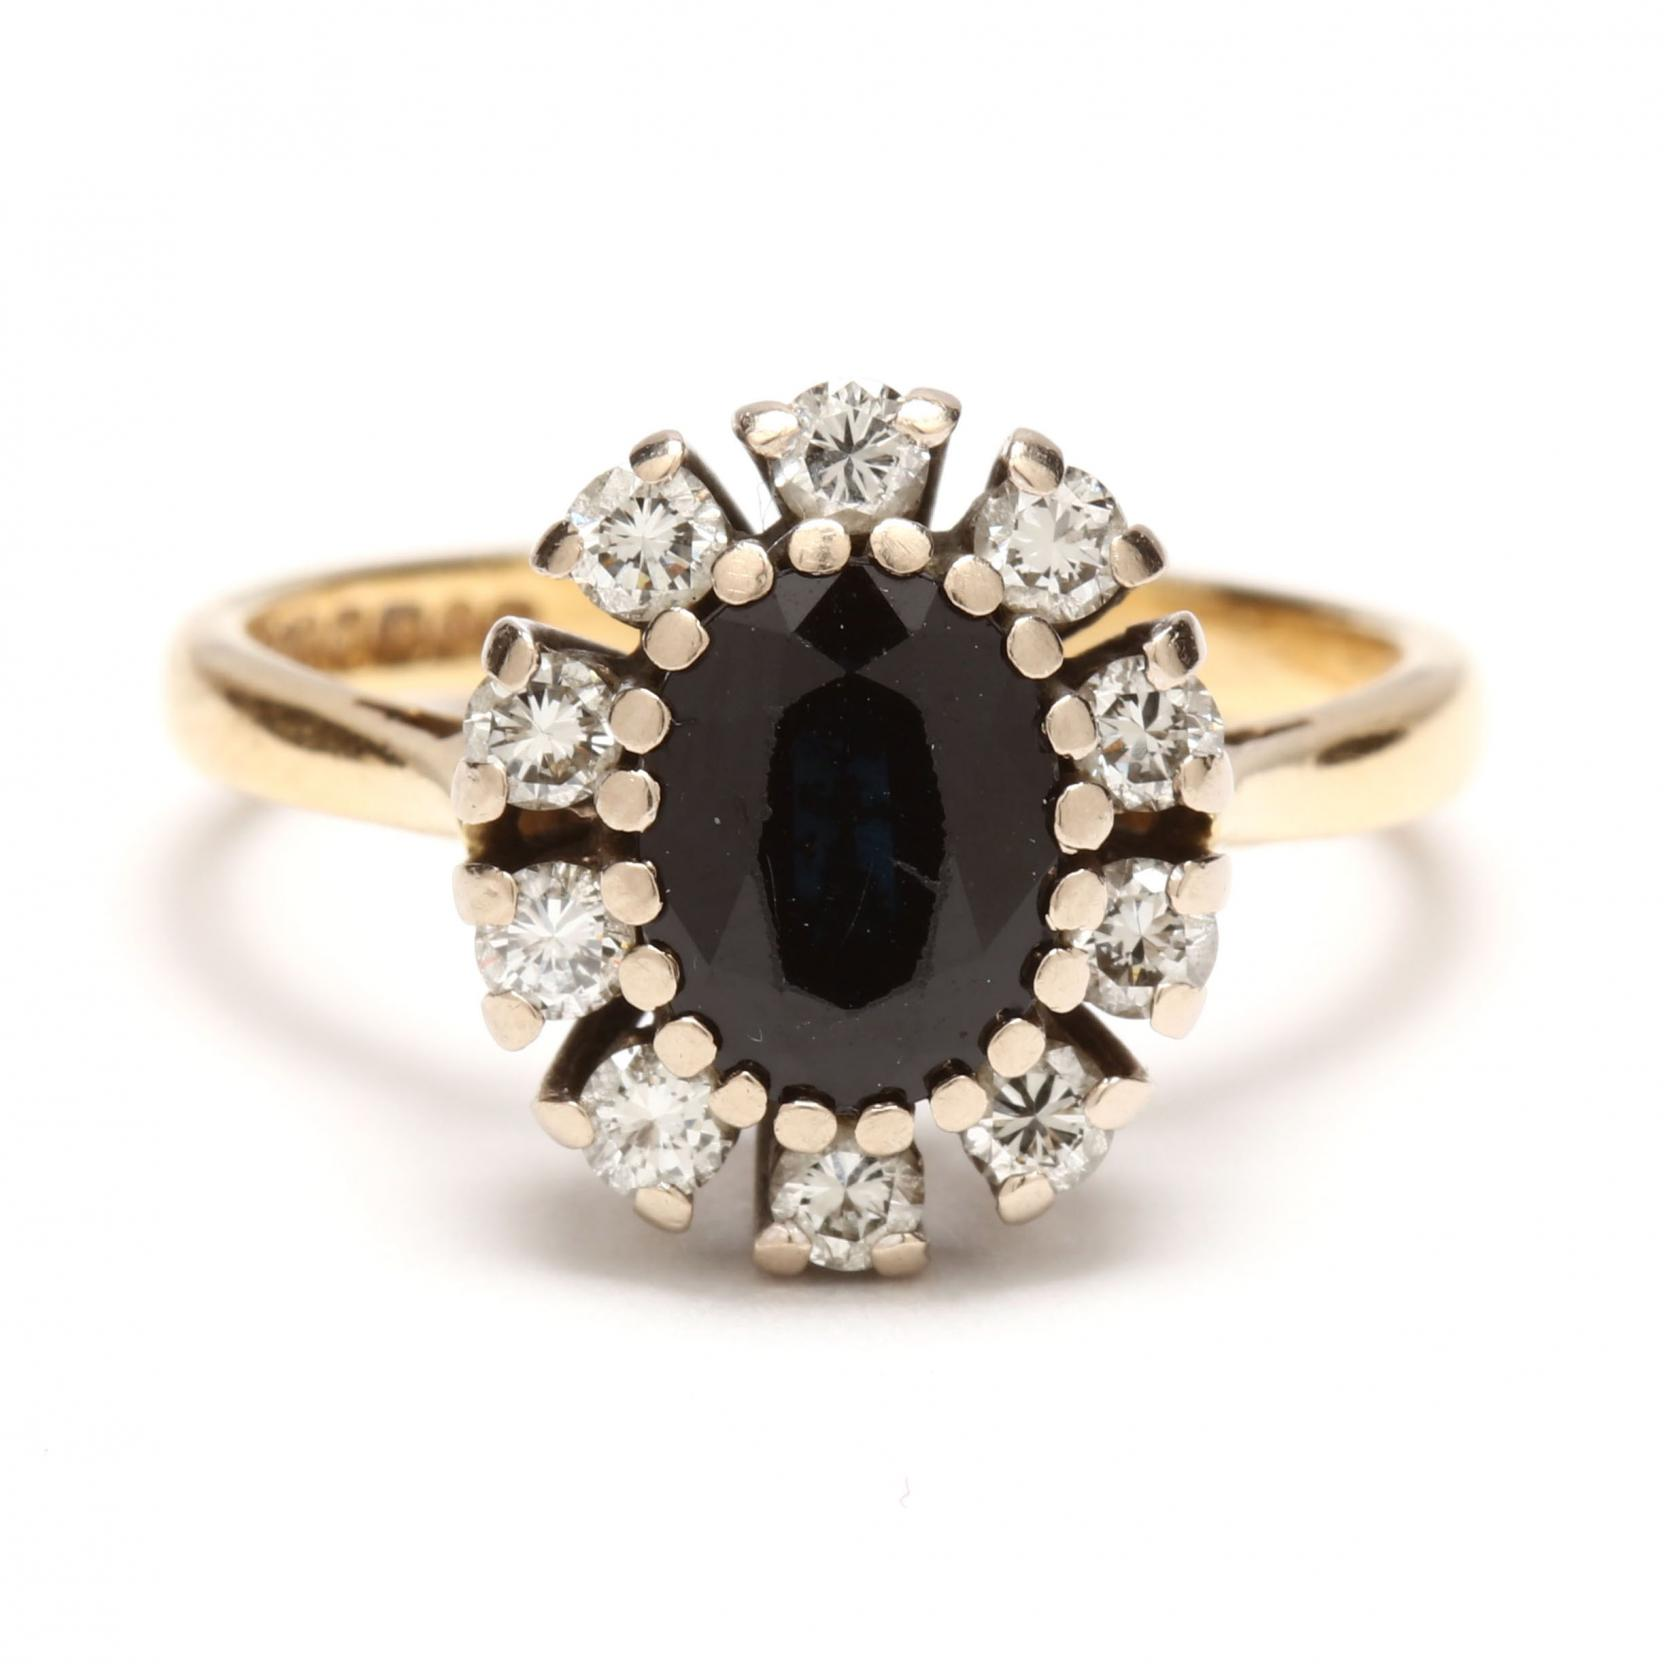 vintage-18kt-sapphire-and-diamond-ring-steele-dolphin-ltd